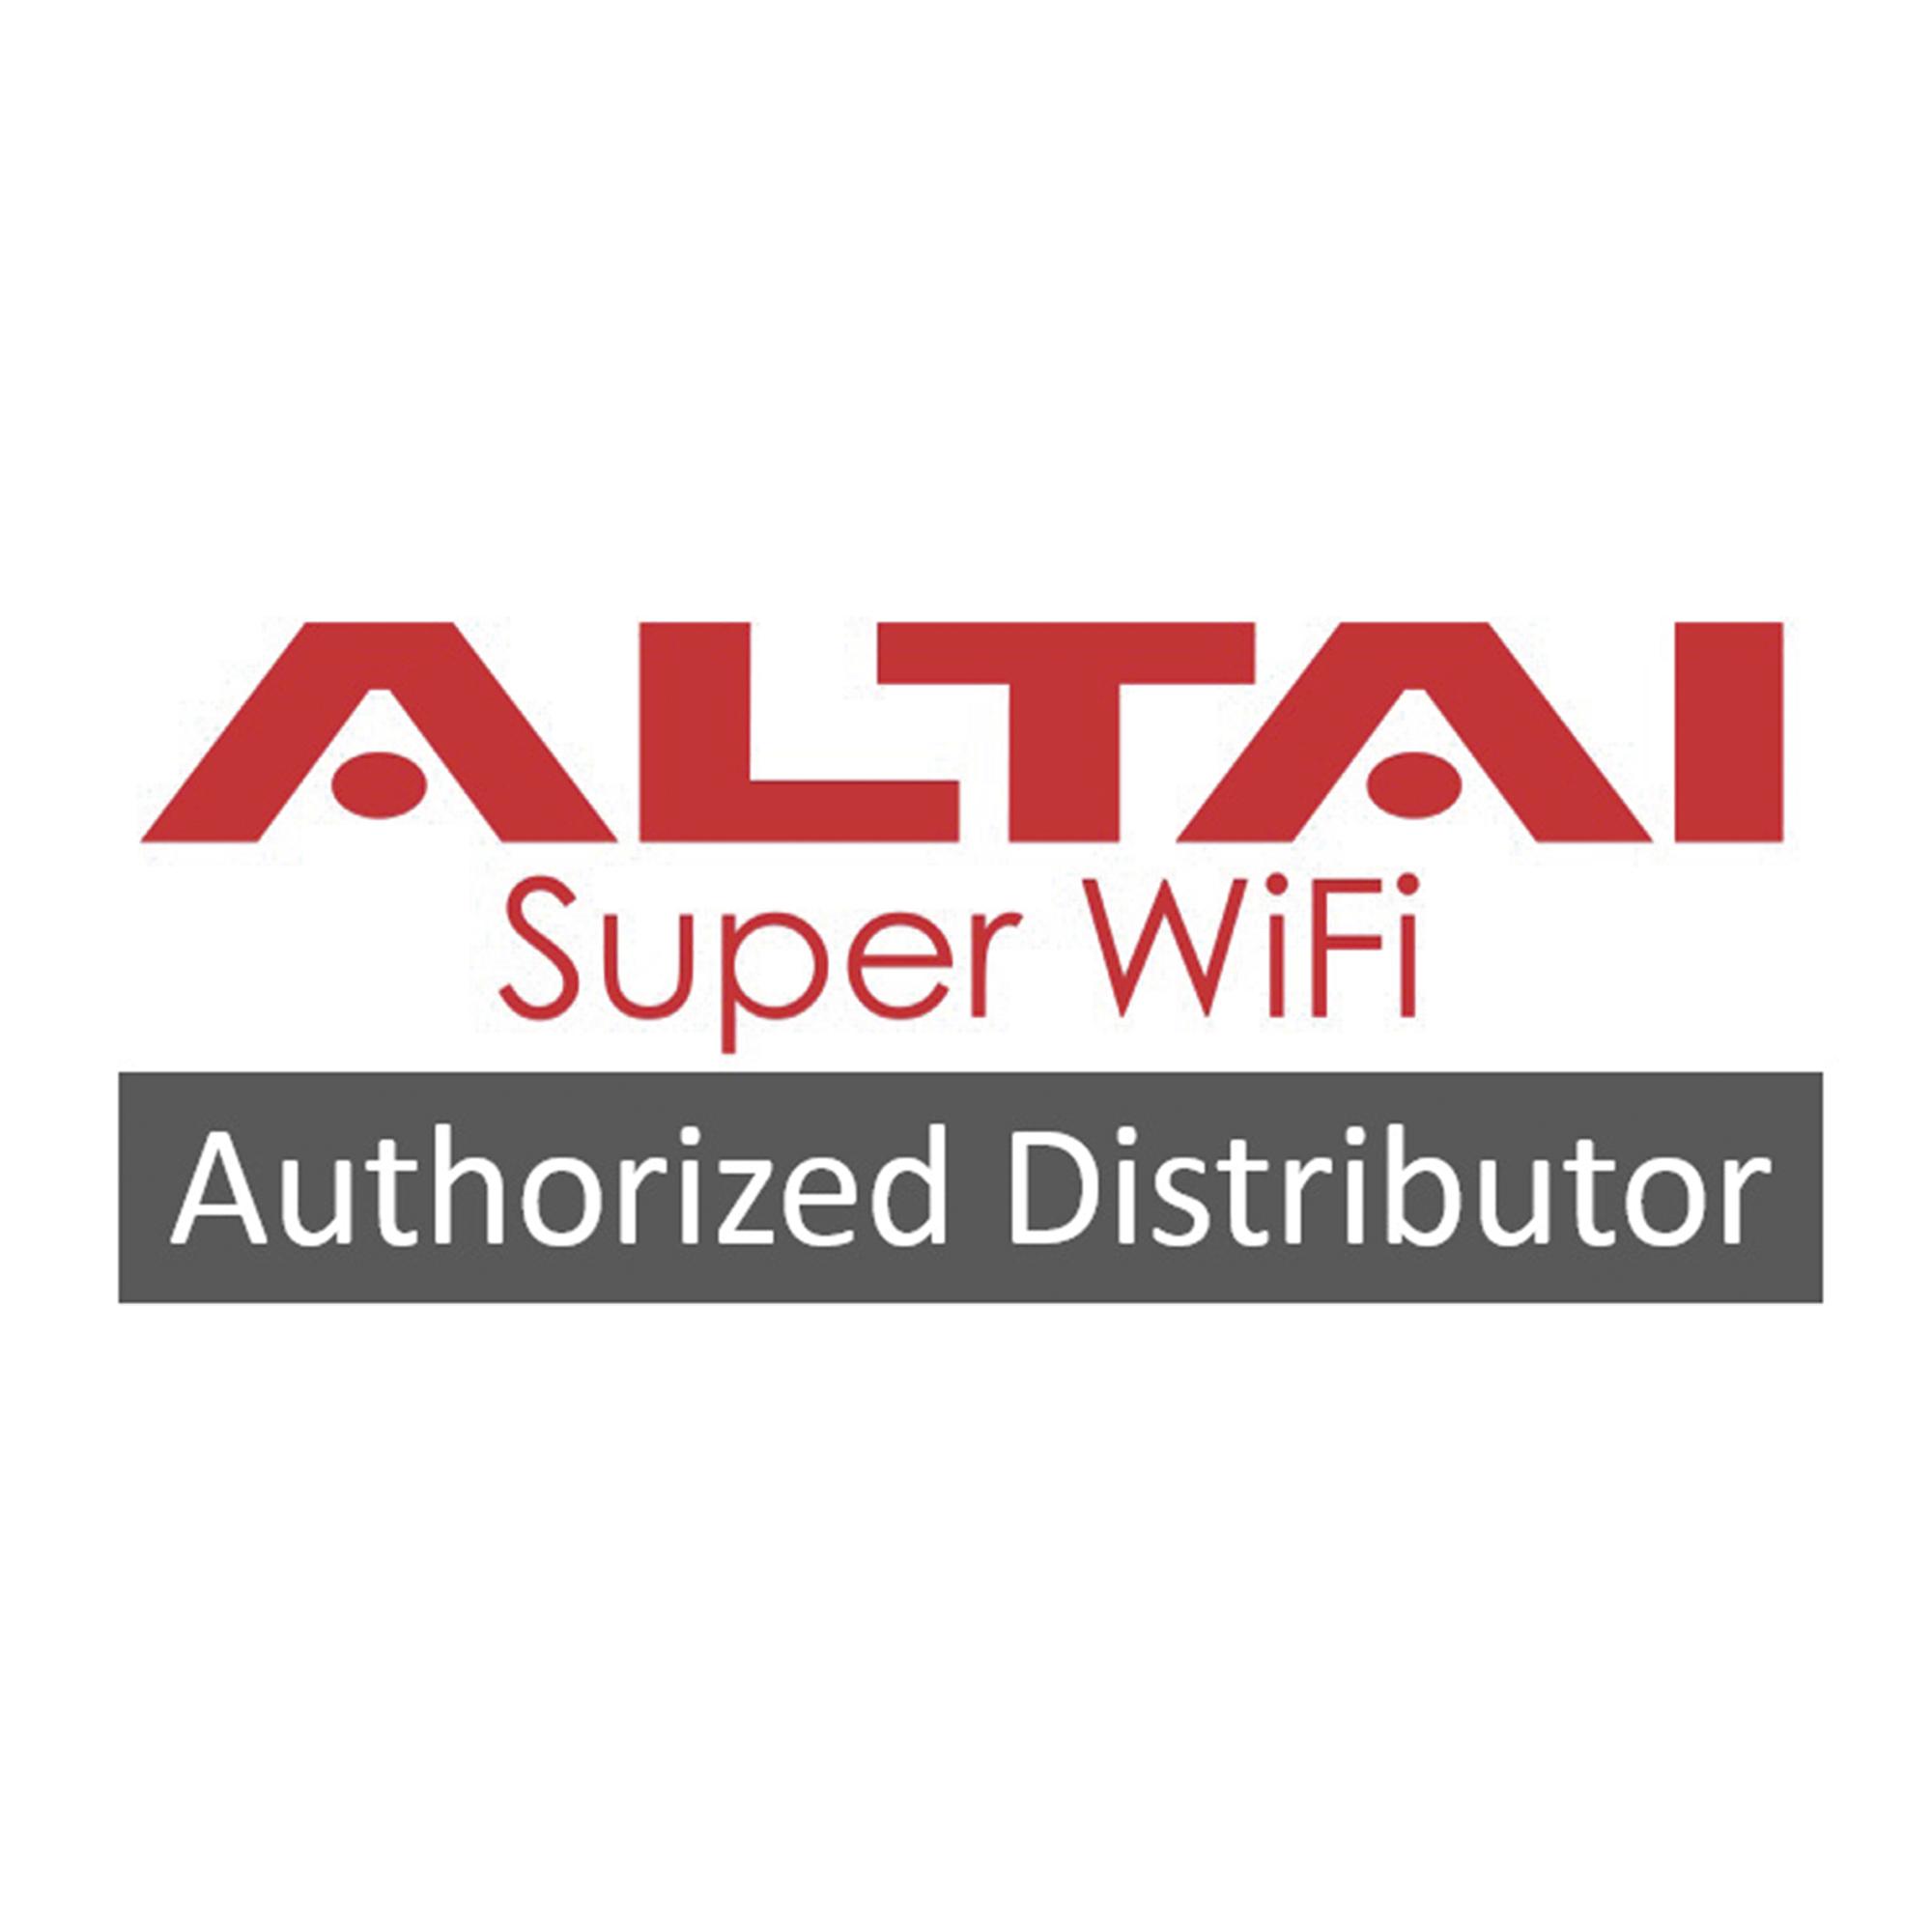 Licencia para gestión de 50 puntos de acceso Super WiFi en controladora AltaiGate 200